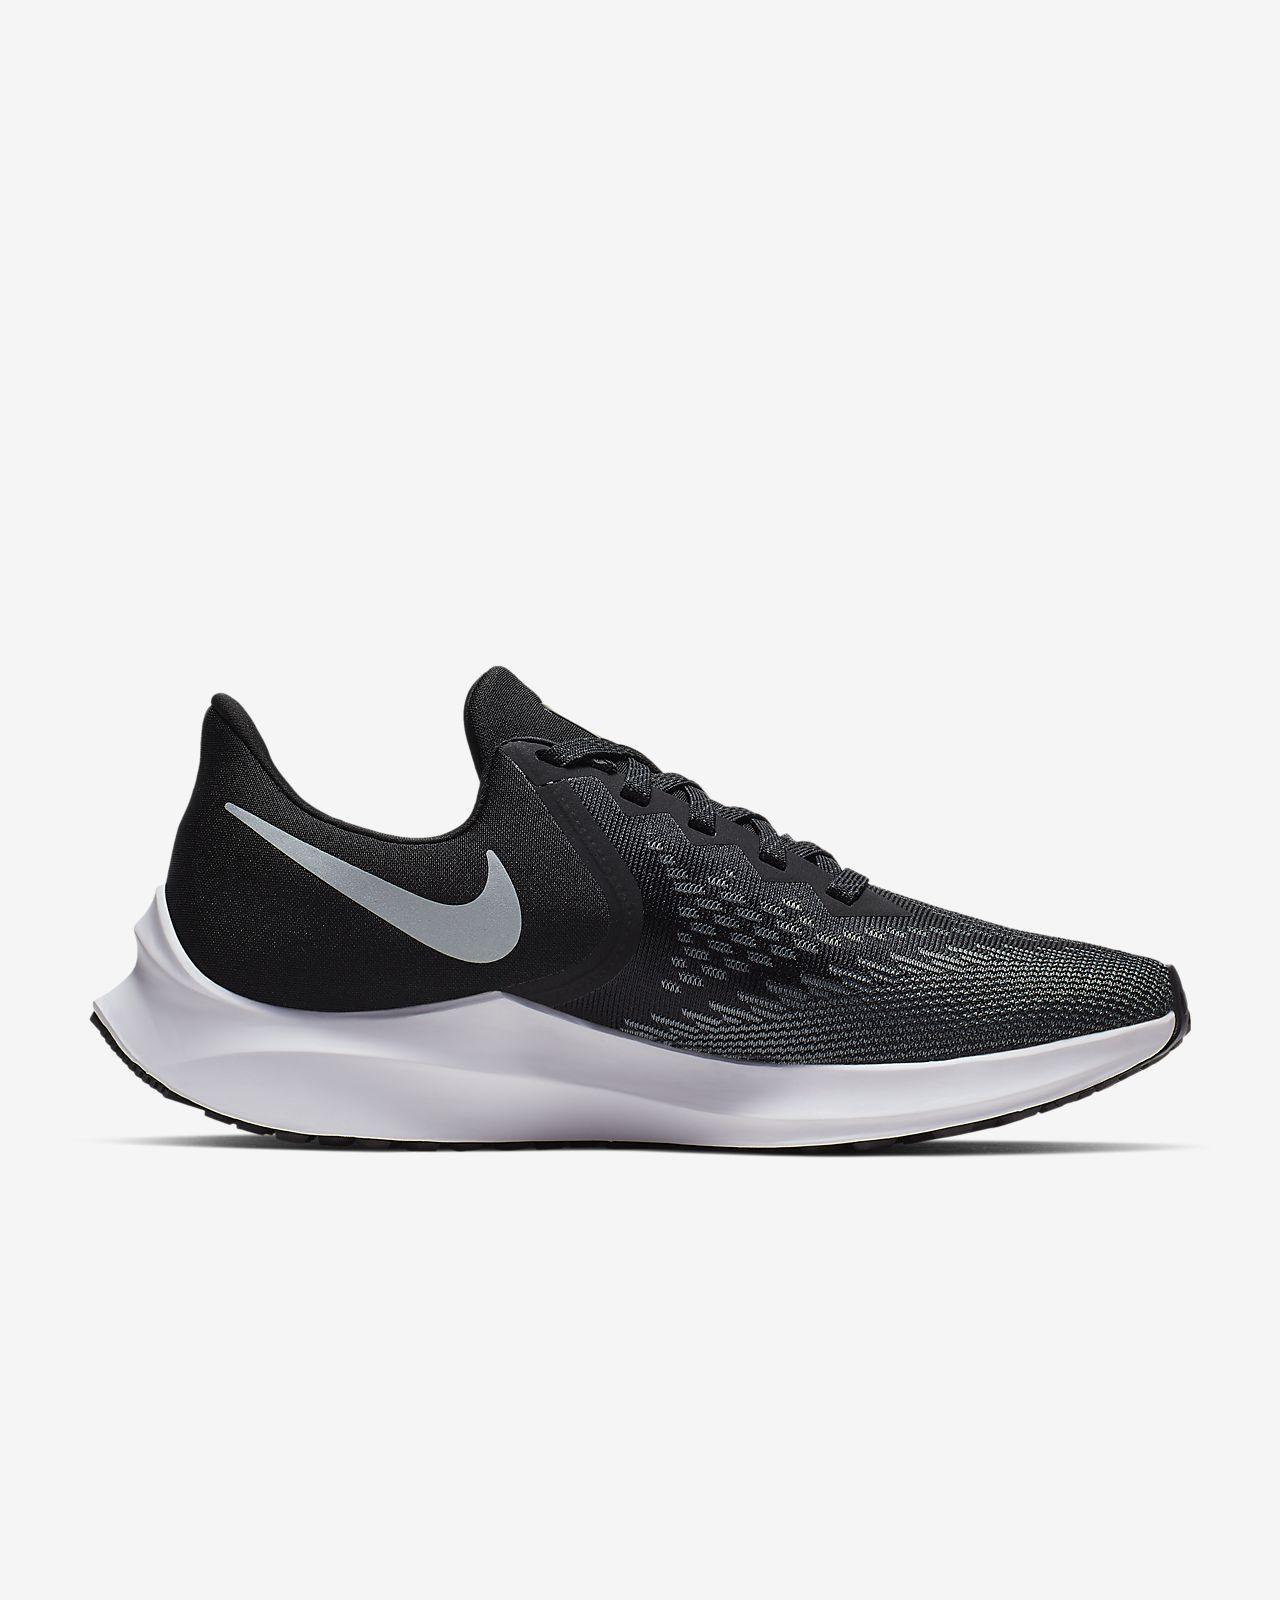 sale retailer cfdfe 0873f รองเท้าวิ่งผู้หญิง Nike Air Zoom Winflo 6